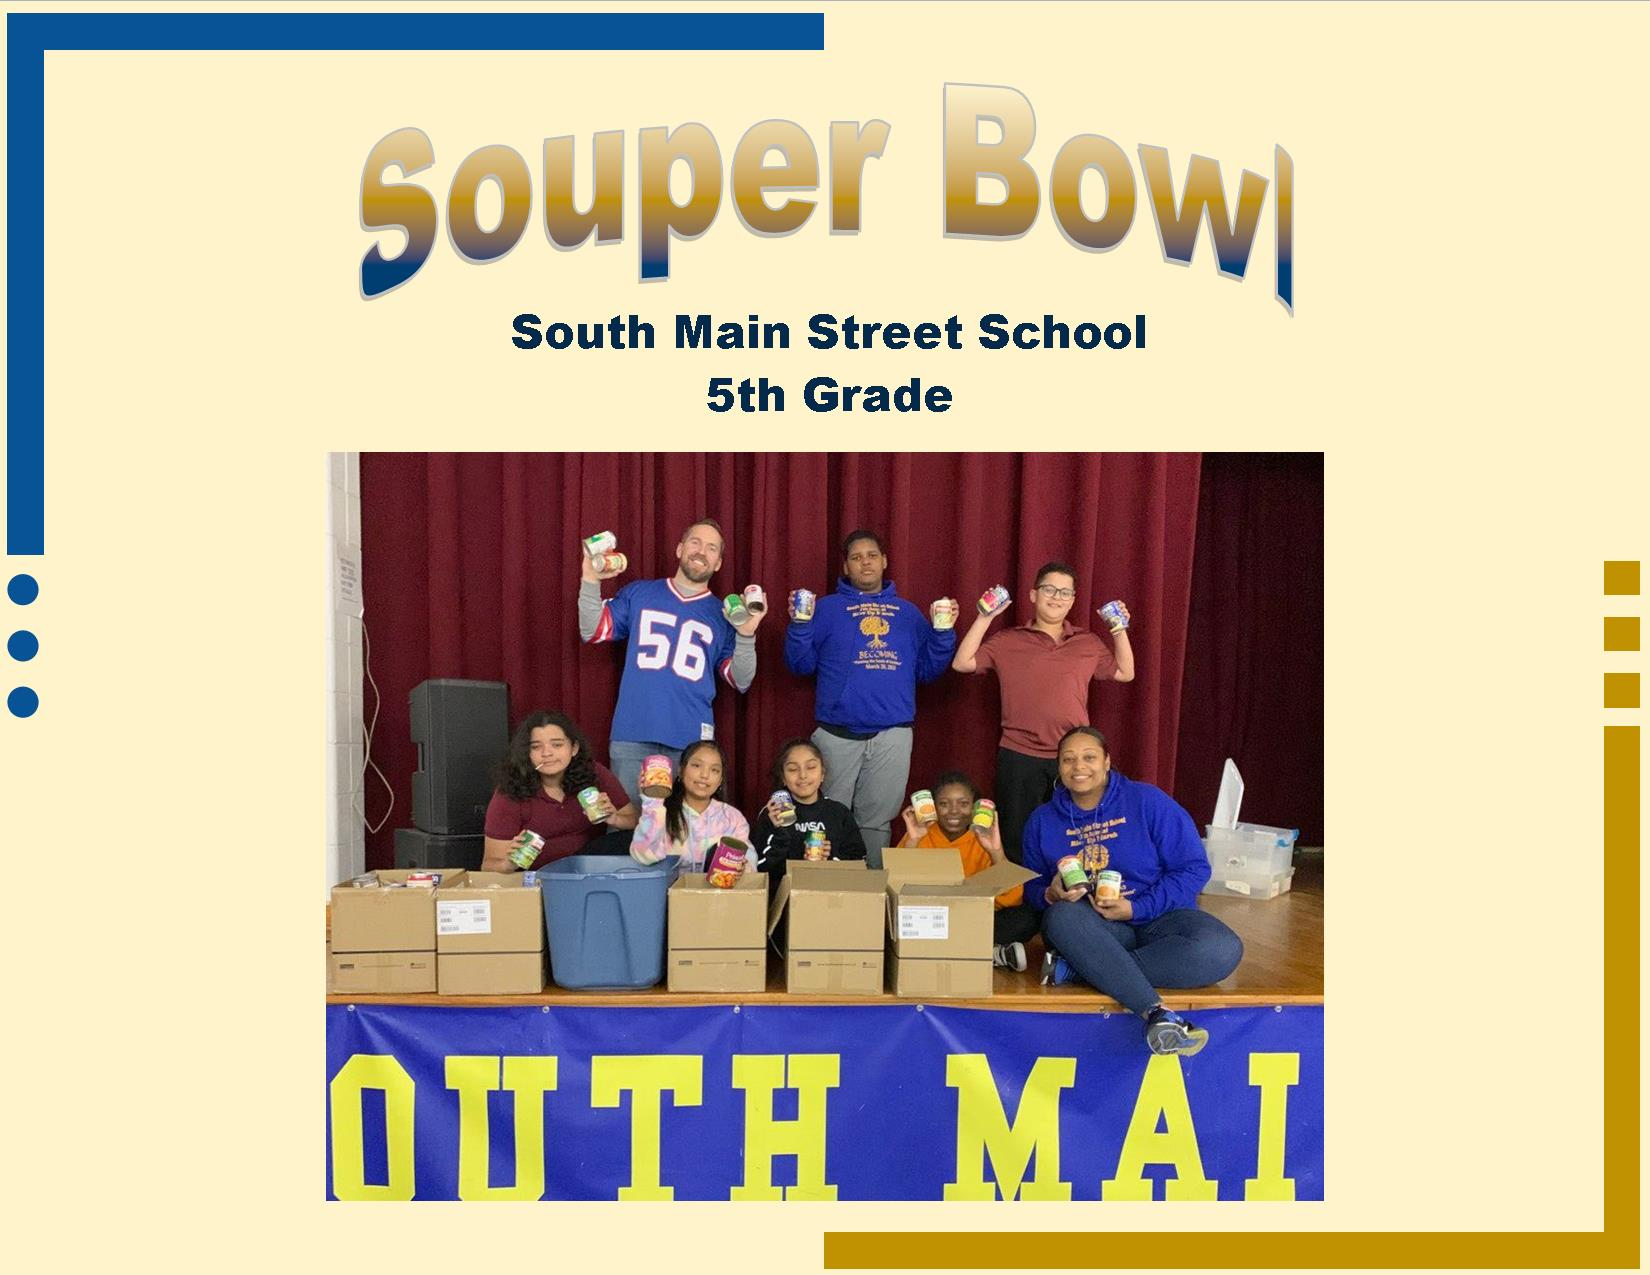 Souper Bowl South Main Street 5th Grade